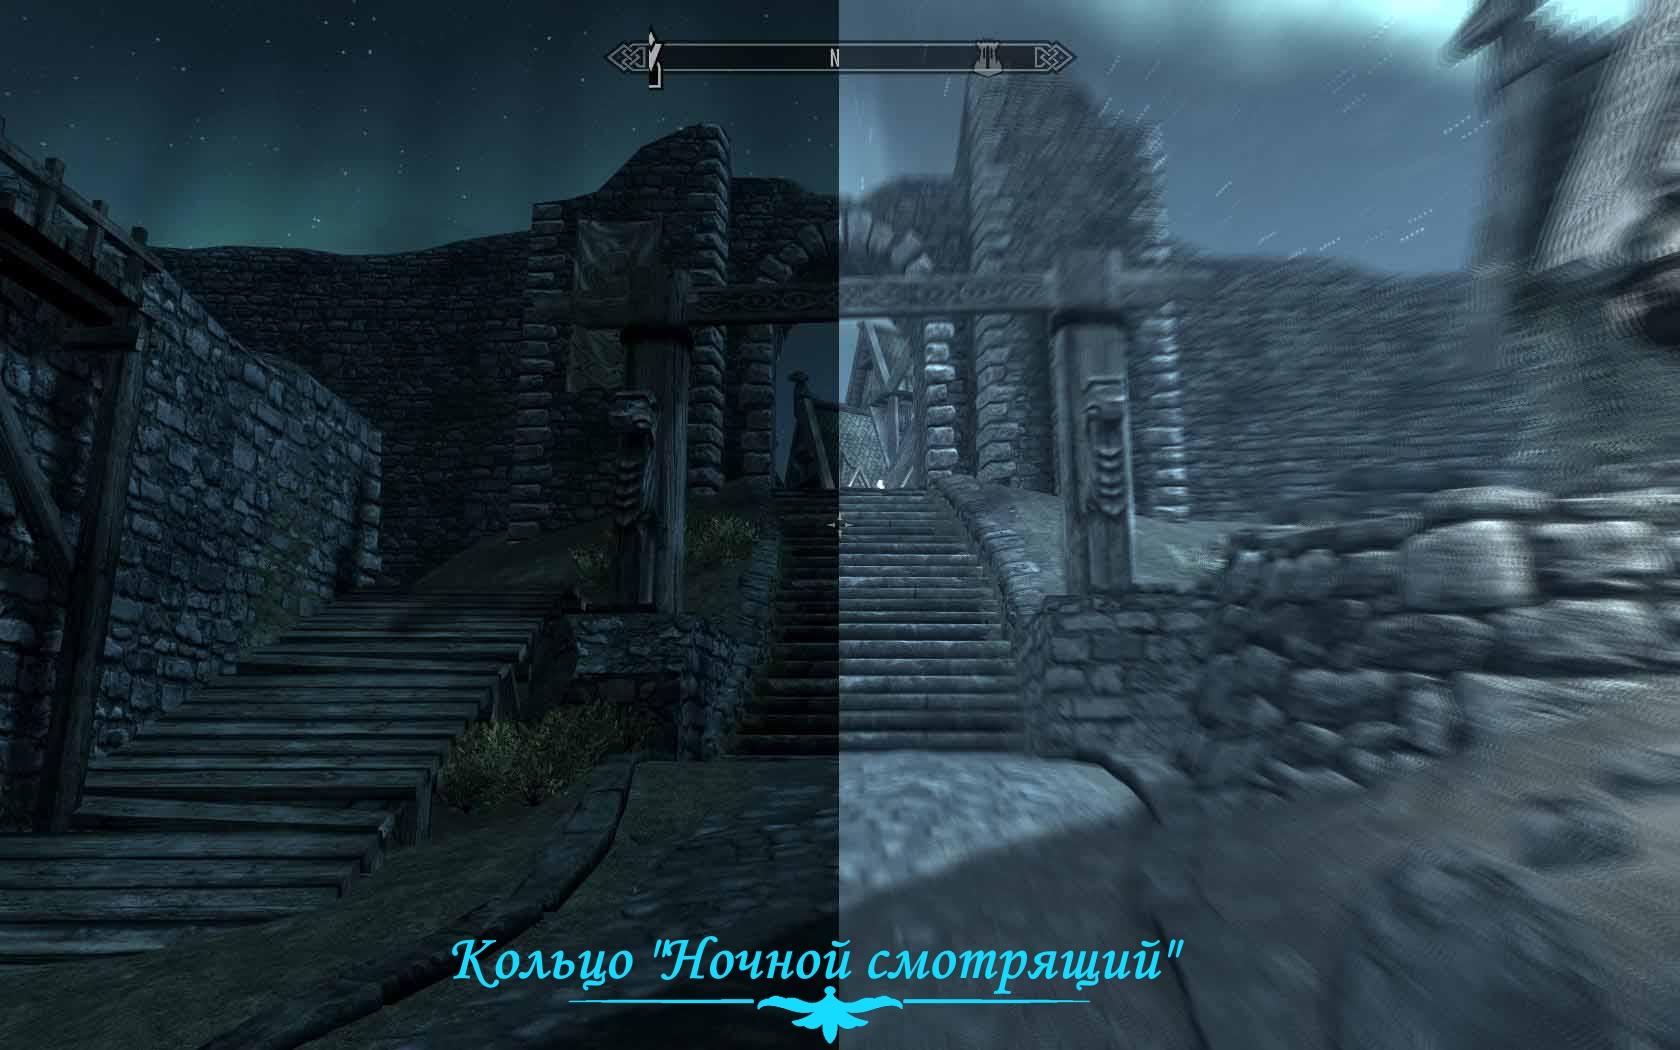 Кольцо_Ночной_смотрящий_01.jpg